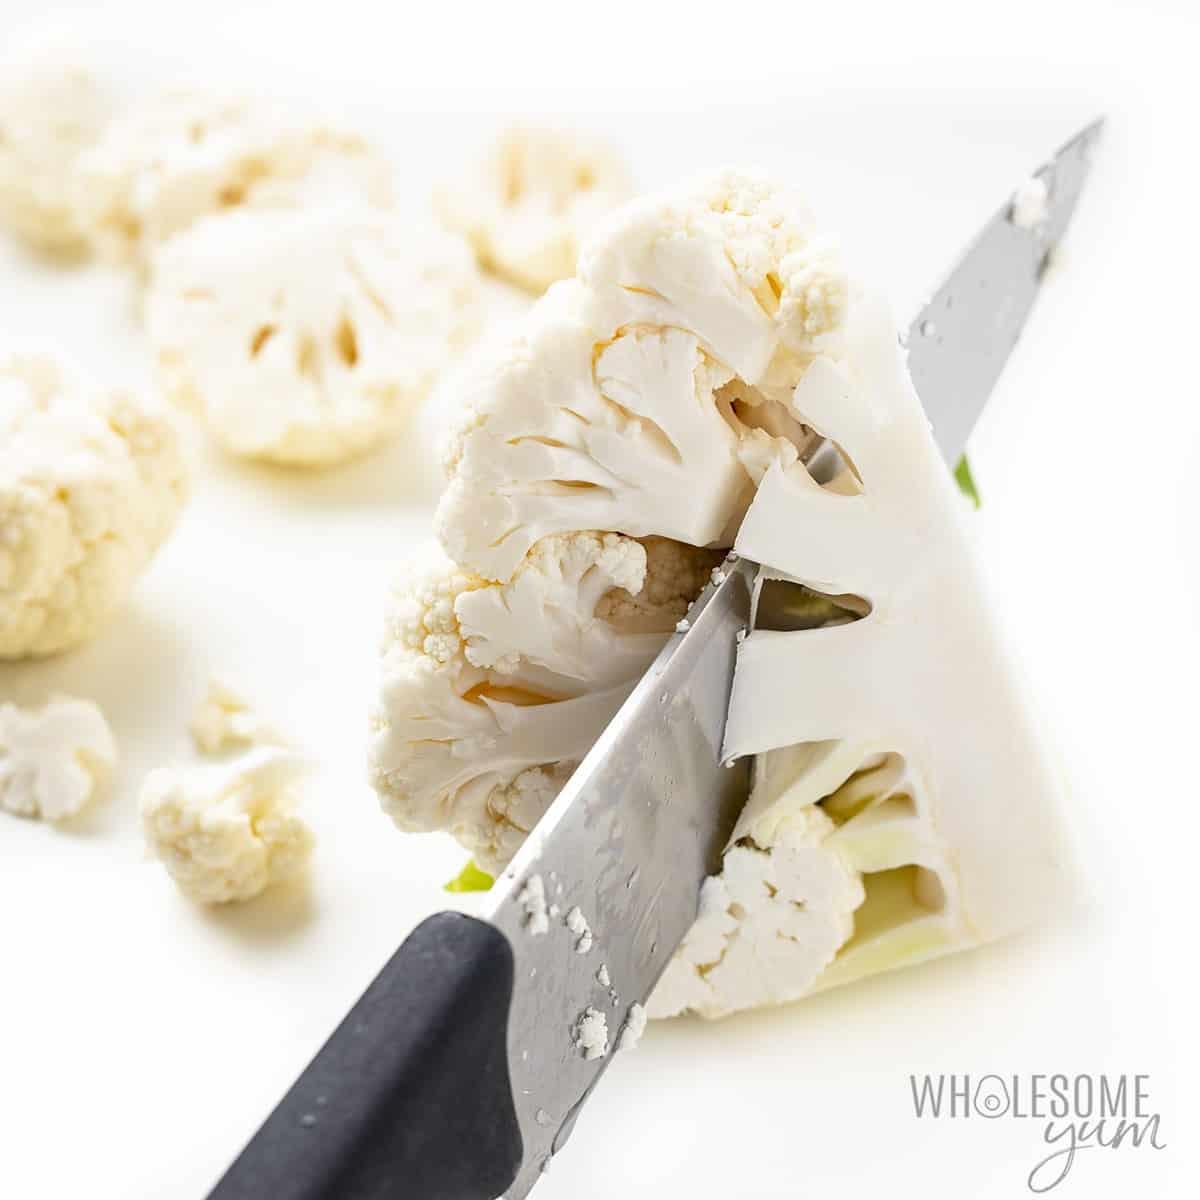 How to remove cauliflower stems